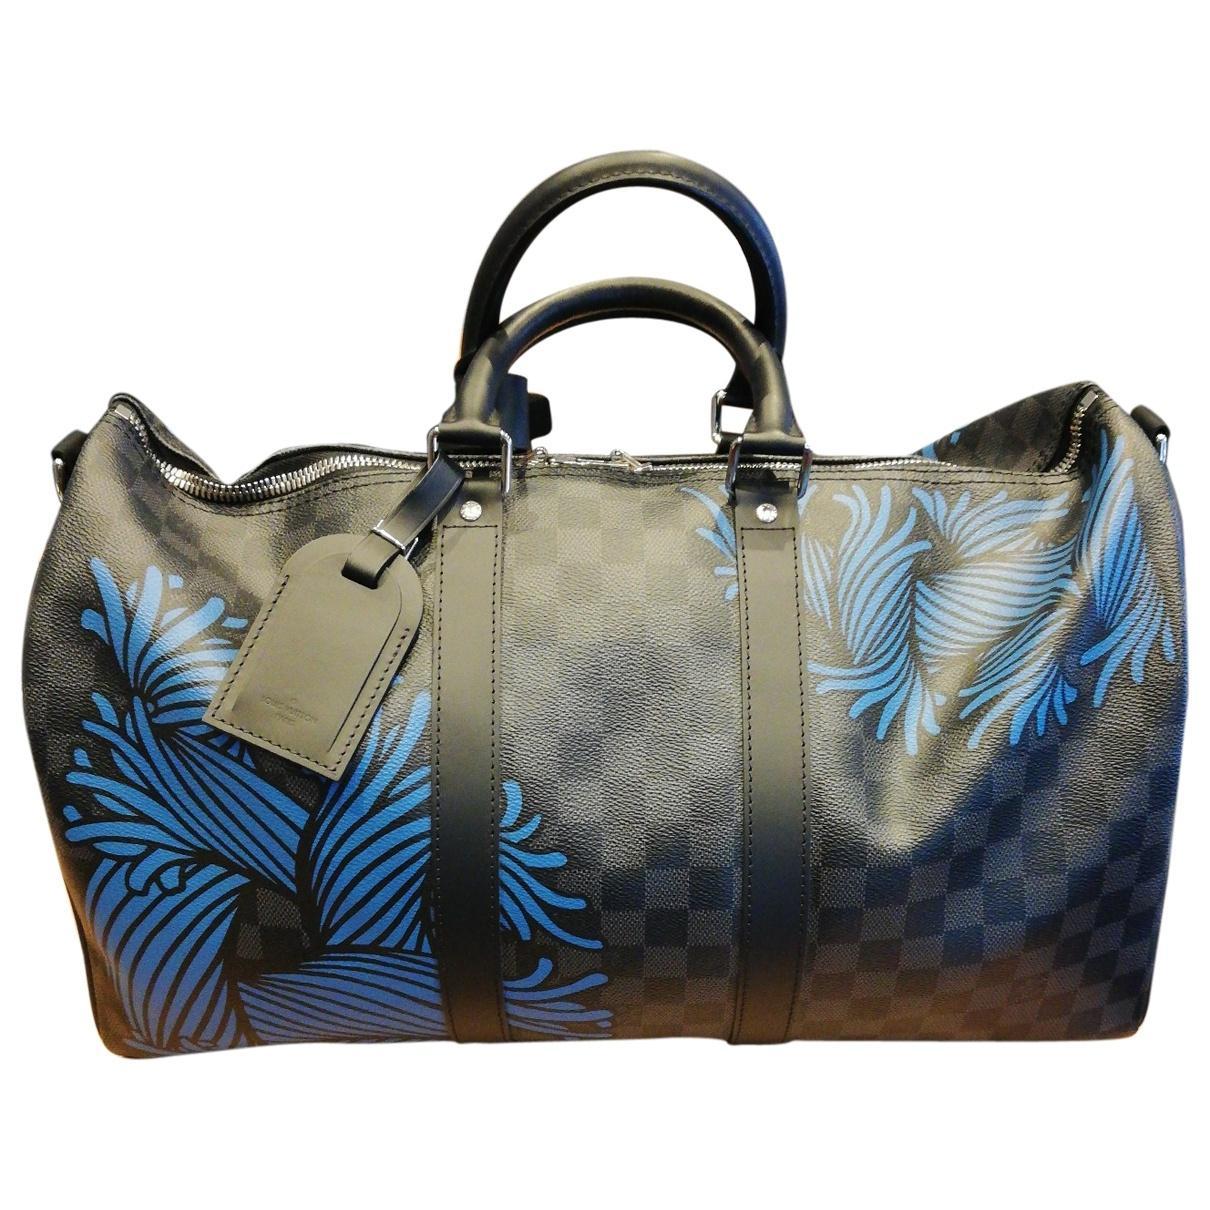 48ea8984b7 Sac week-end Keepall en toile Louis Vuitton pour homme en coloris ...